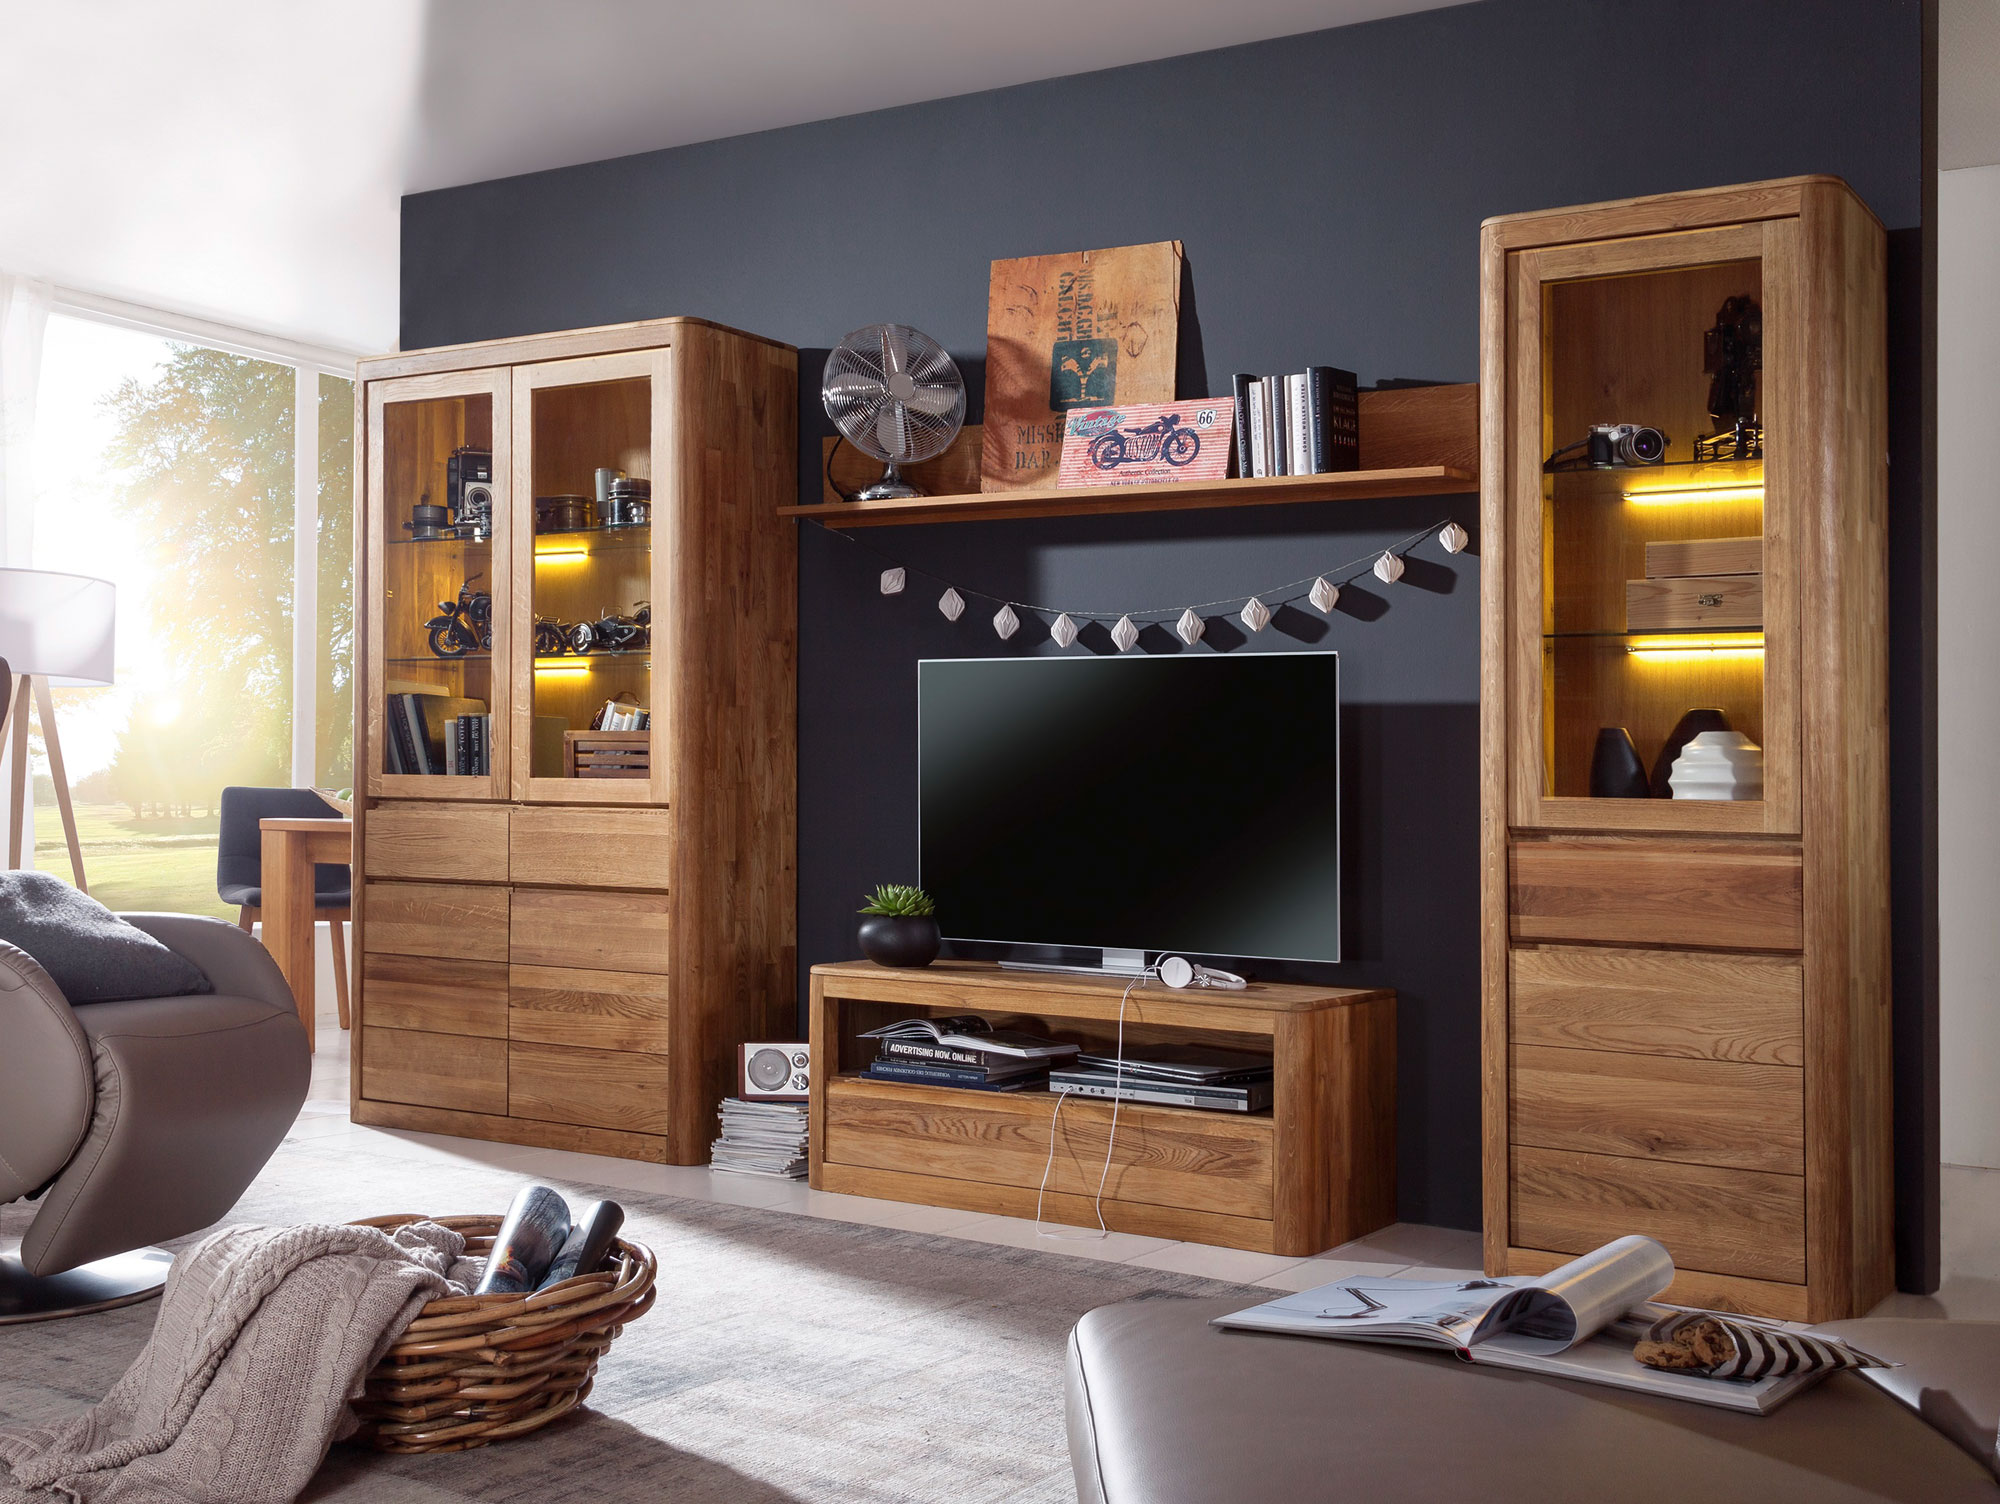 astoria ii wohnwand wildeiche massiv ge lt. Black Bedroom Furniture Sets. Home Design Ideas